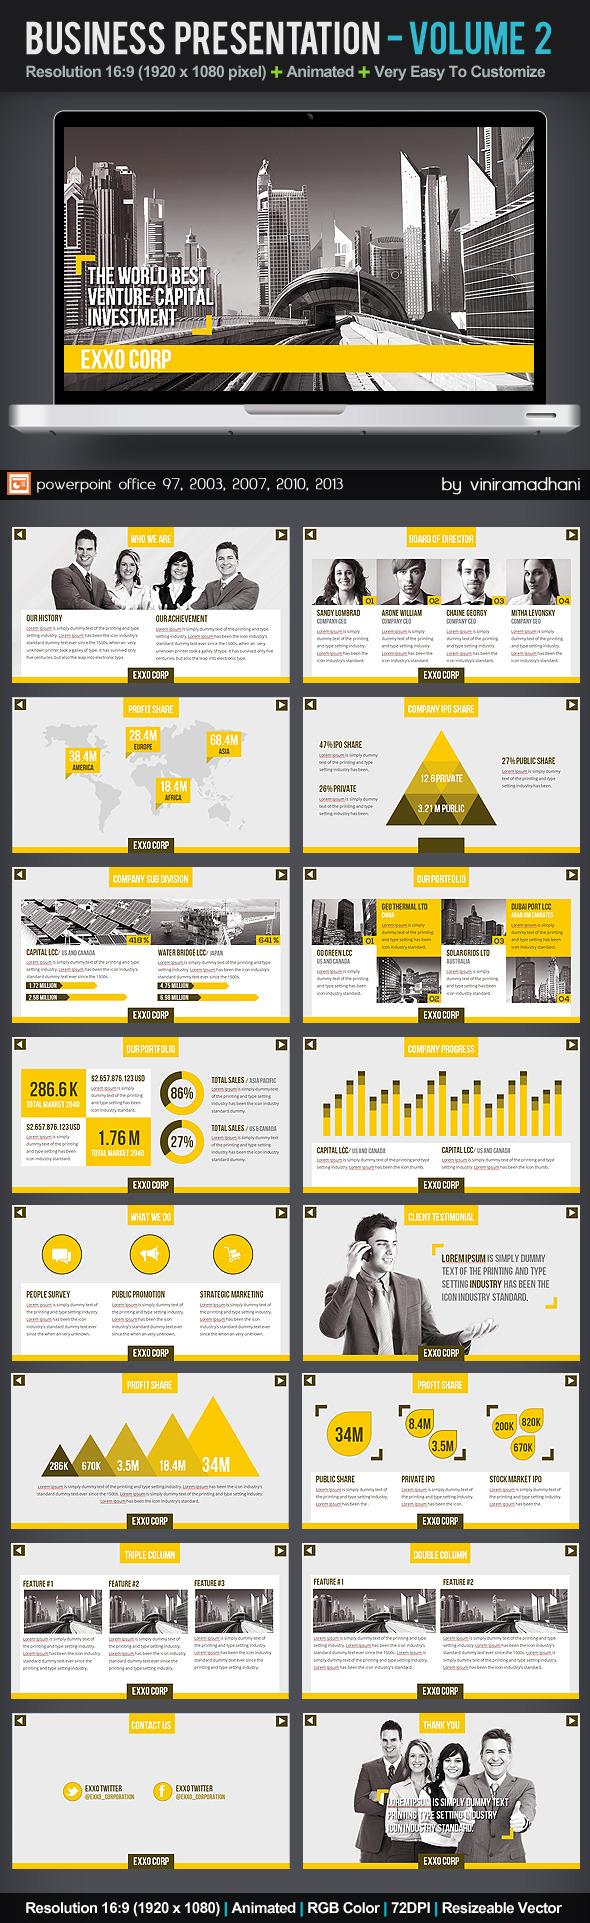 Business Presentation | Volume 2